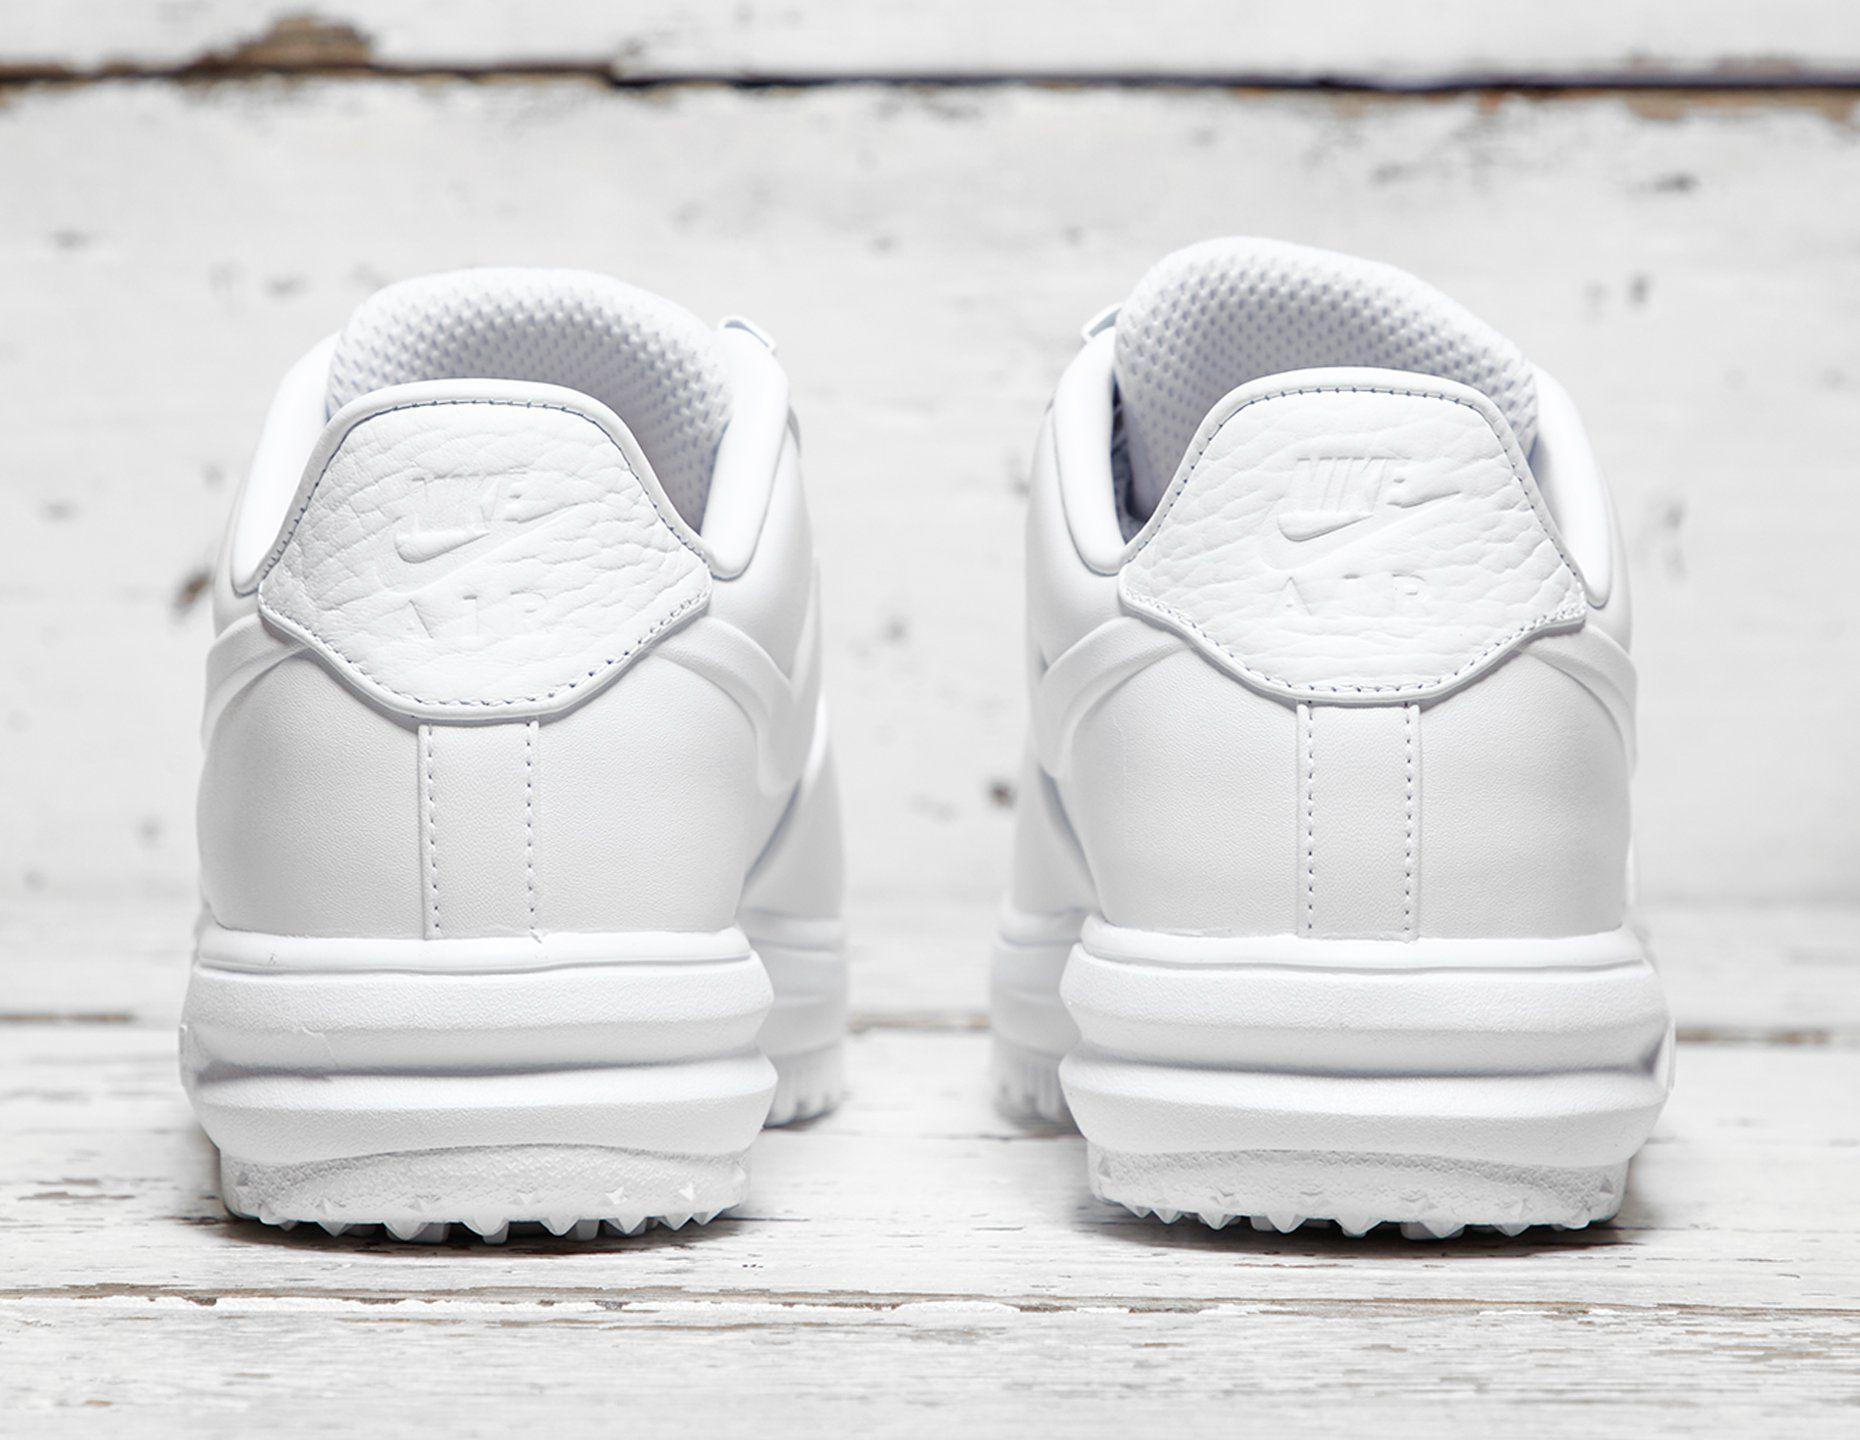 Nike LF1 Duckboot Low 'IBEX'